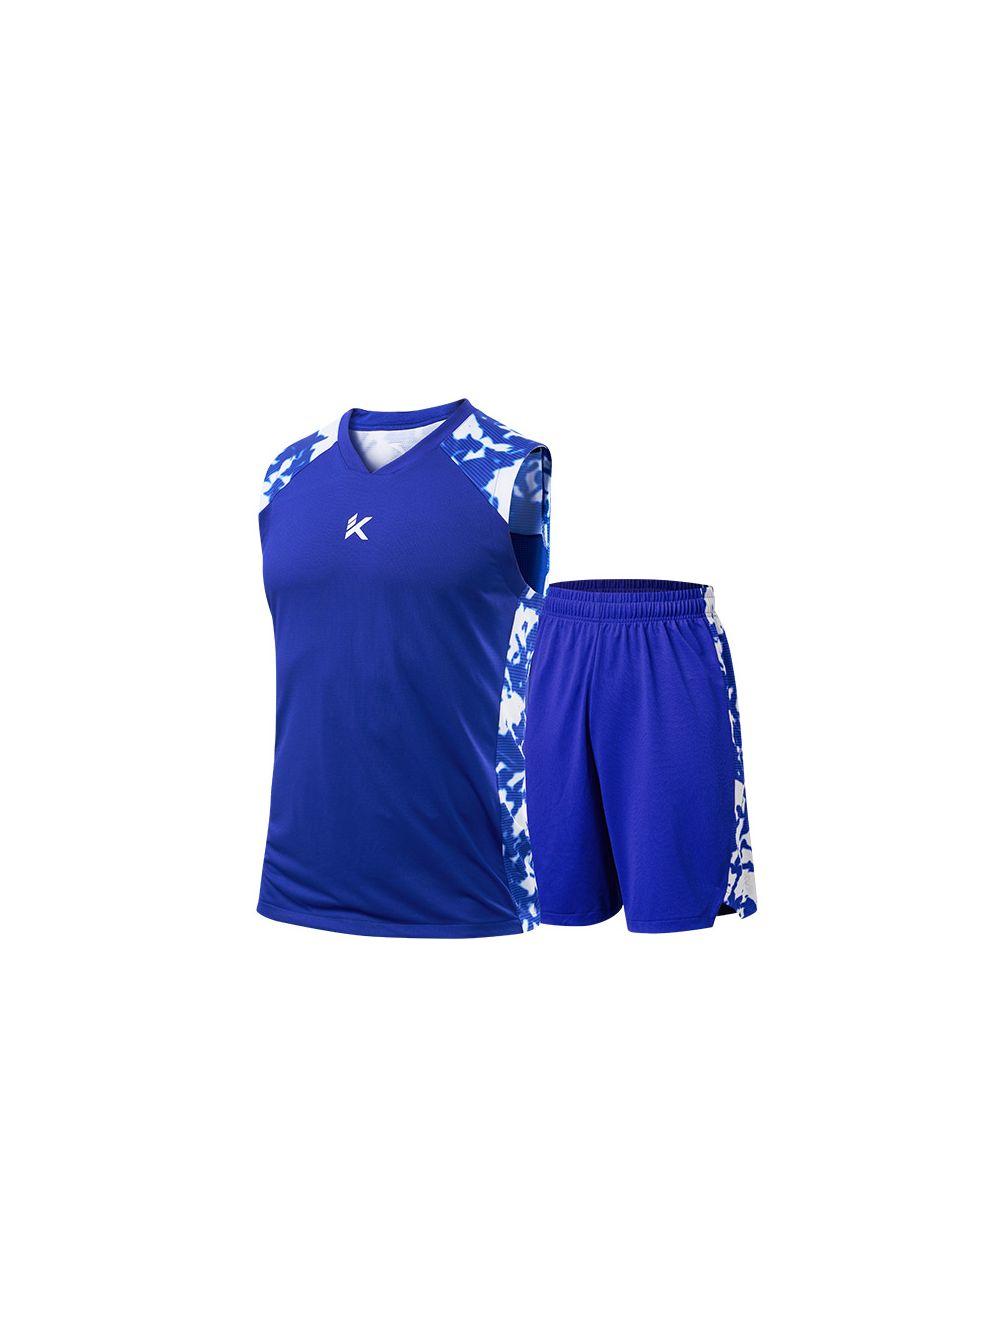 size 40 99a5c 92aeb Anta Klay Thompson KT 2019 Men's Basketball Jersey & Shorts - Blue